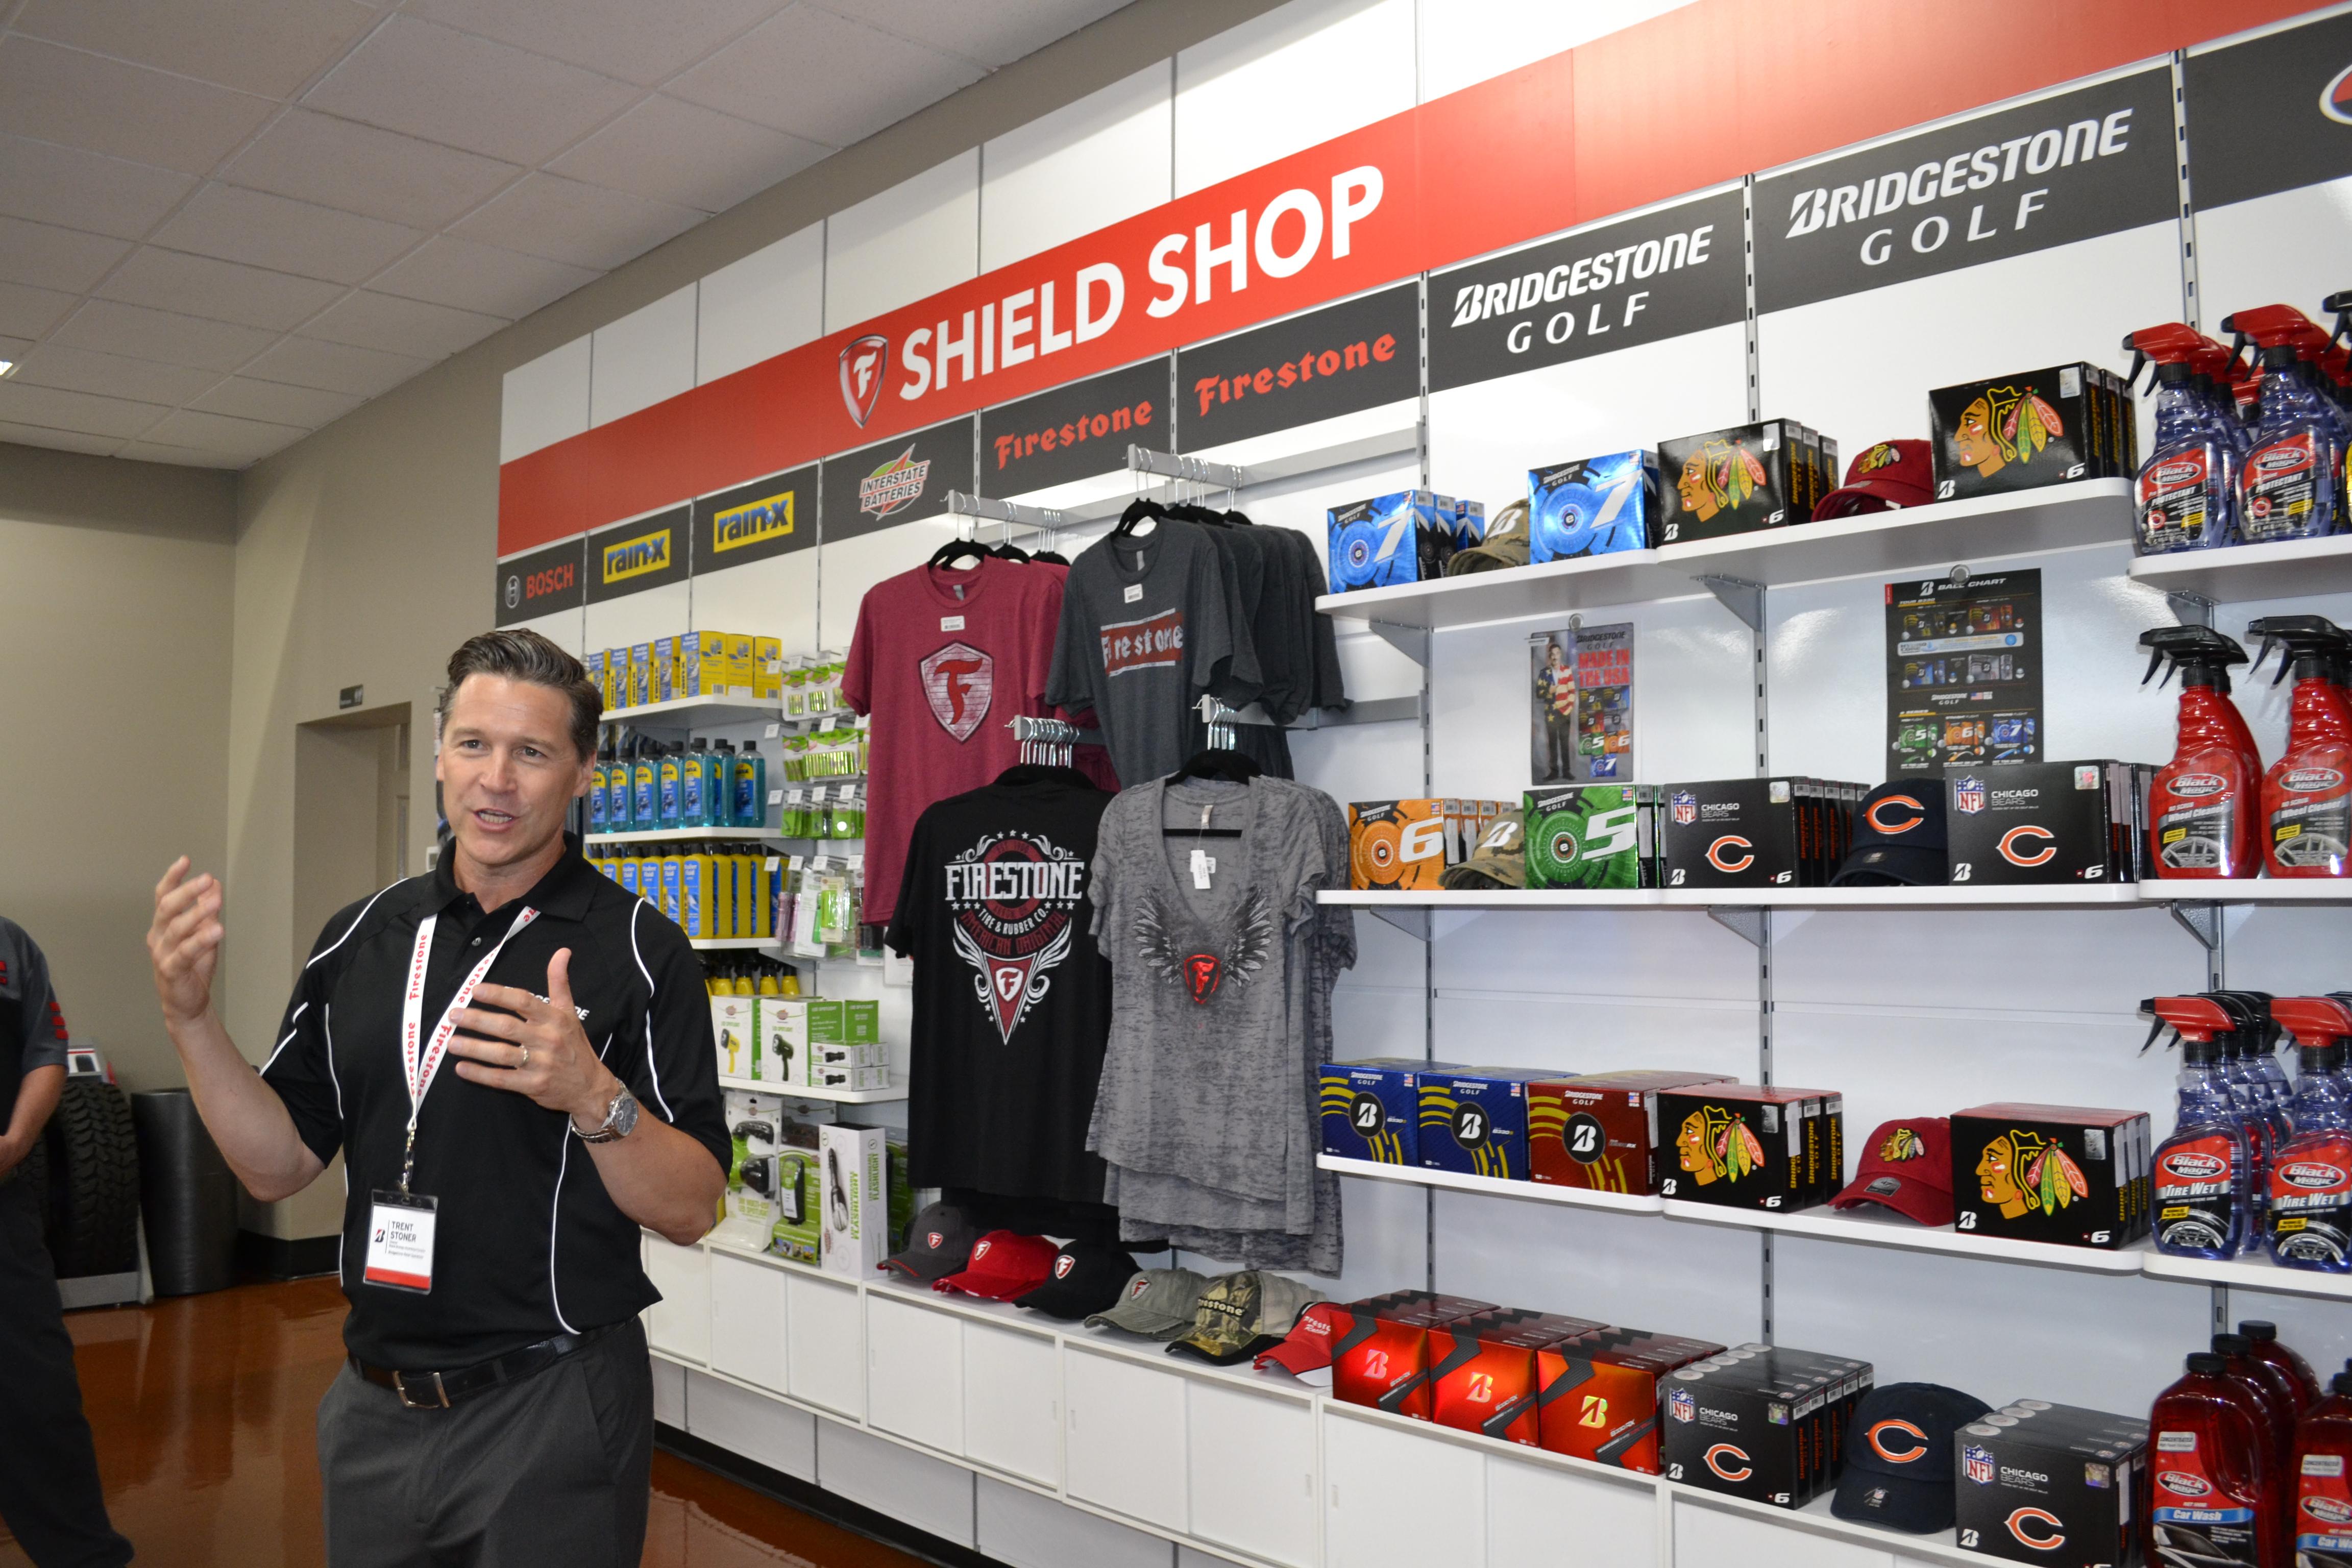 Photos: A Look Inside a Bridgestone Lab Store